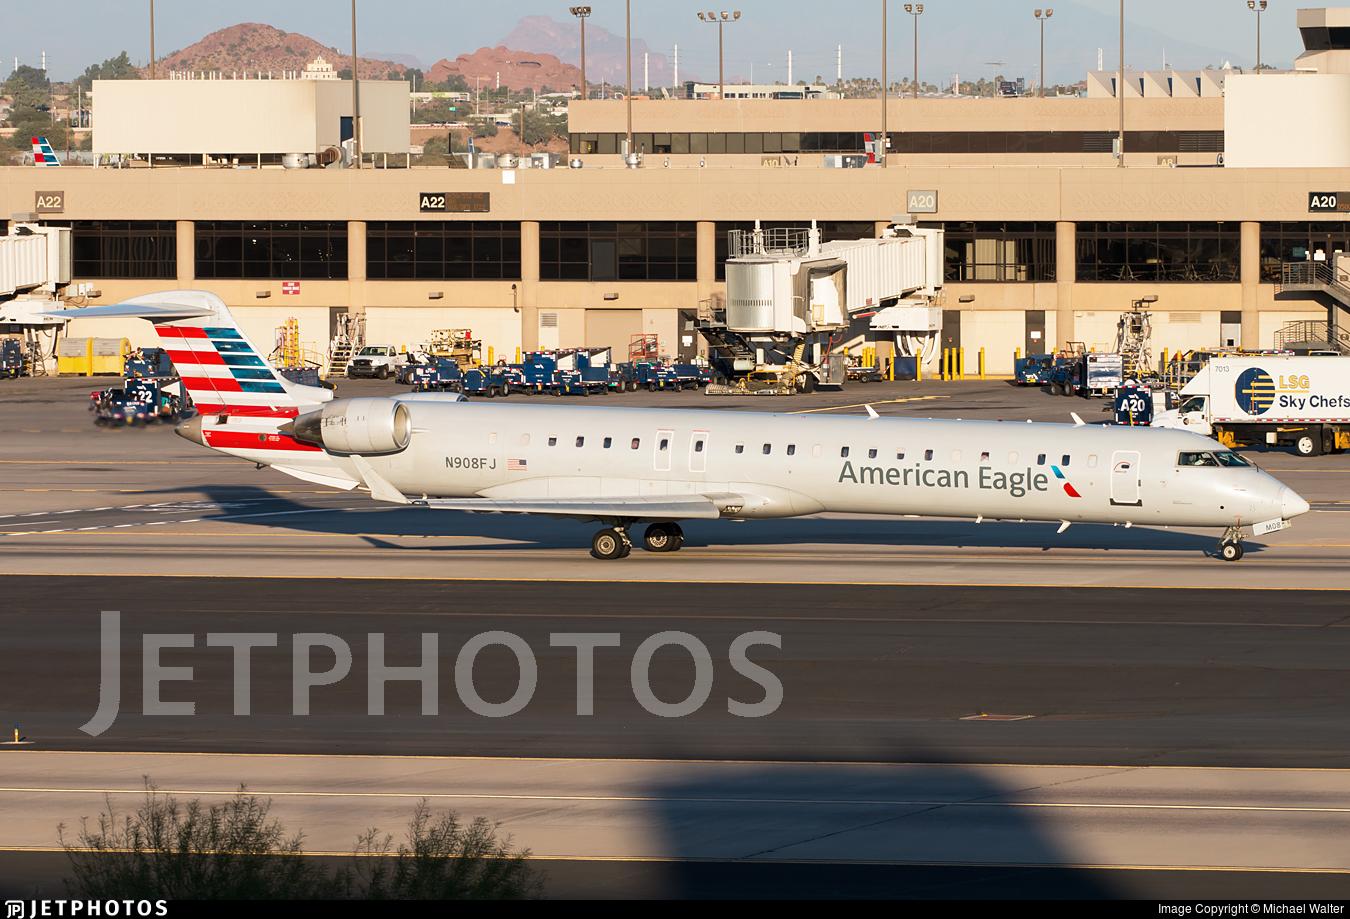 N908FJ - Bombardier CRJ-900ER - American Eagle (Mesa Airlines)